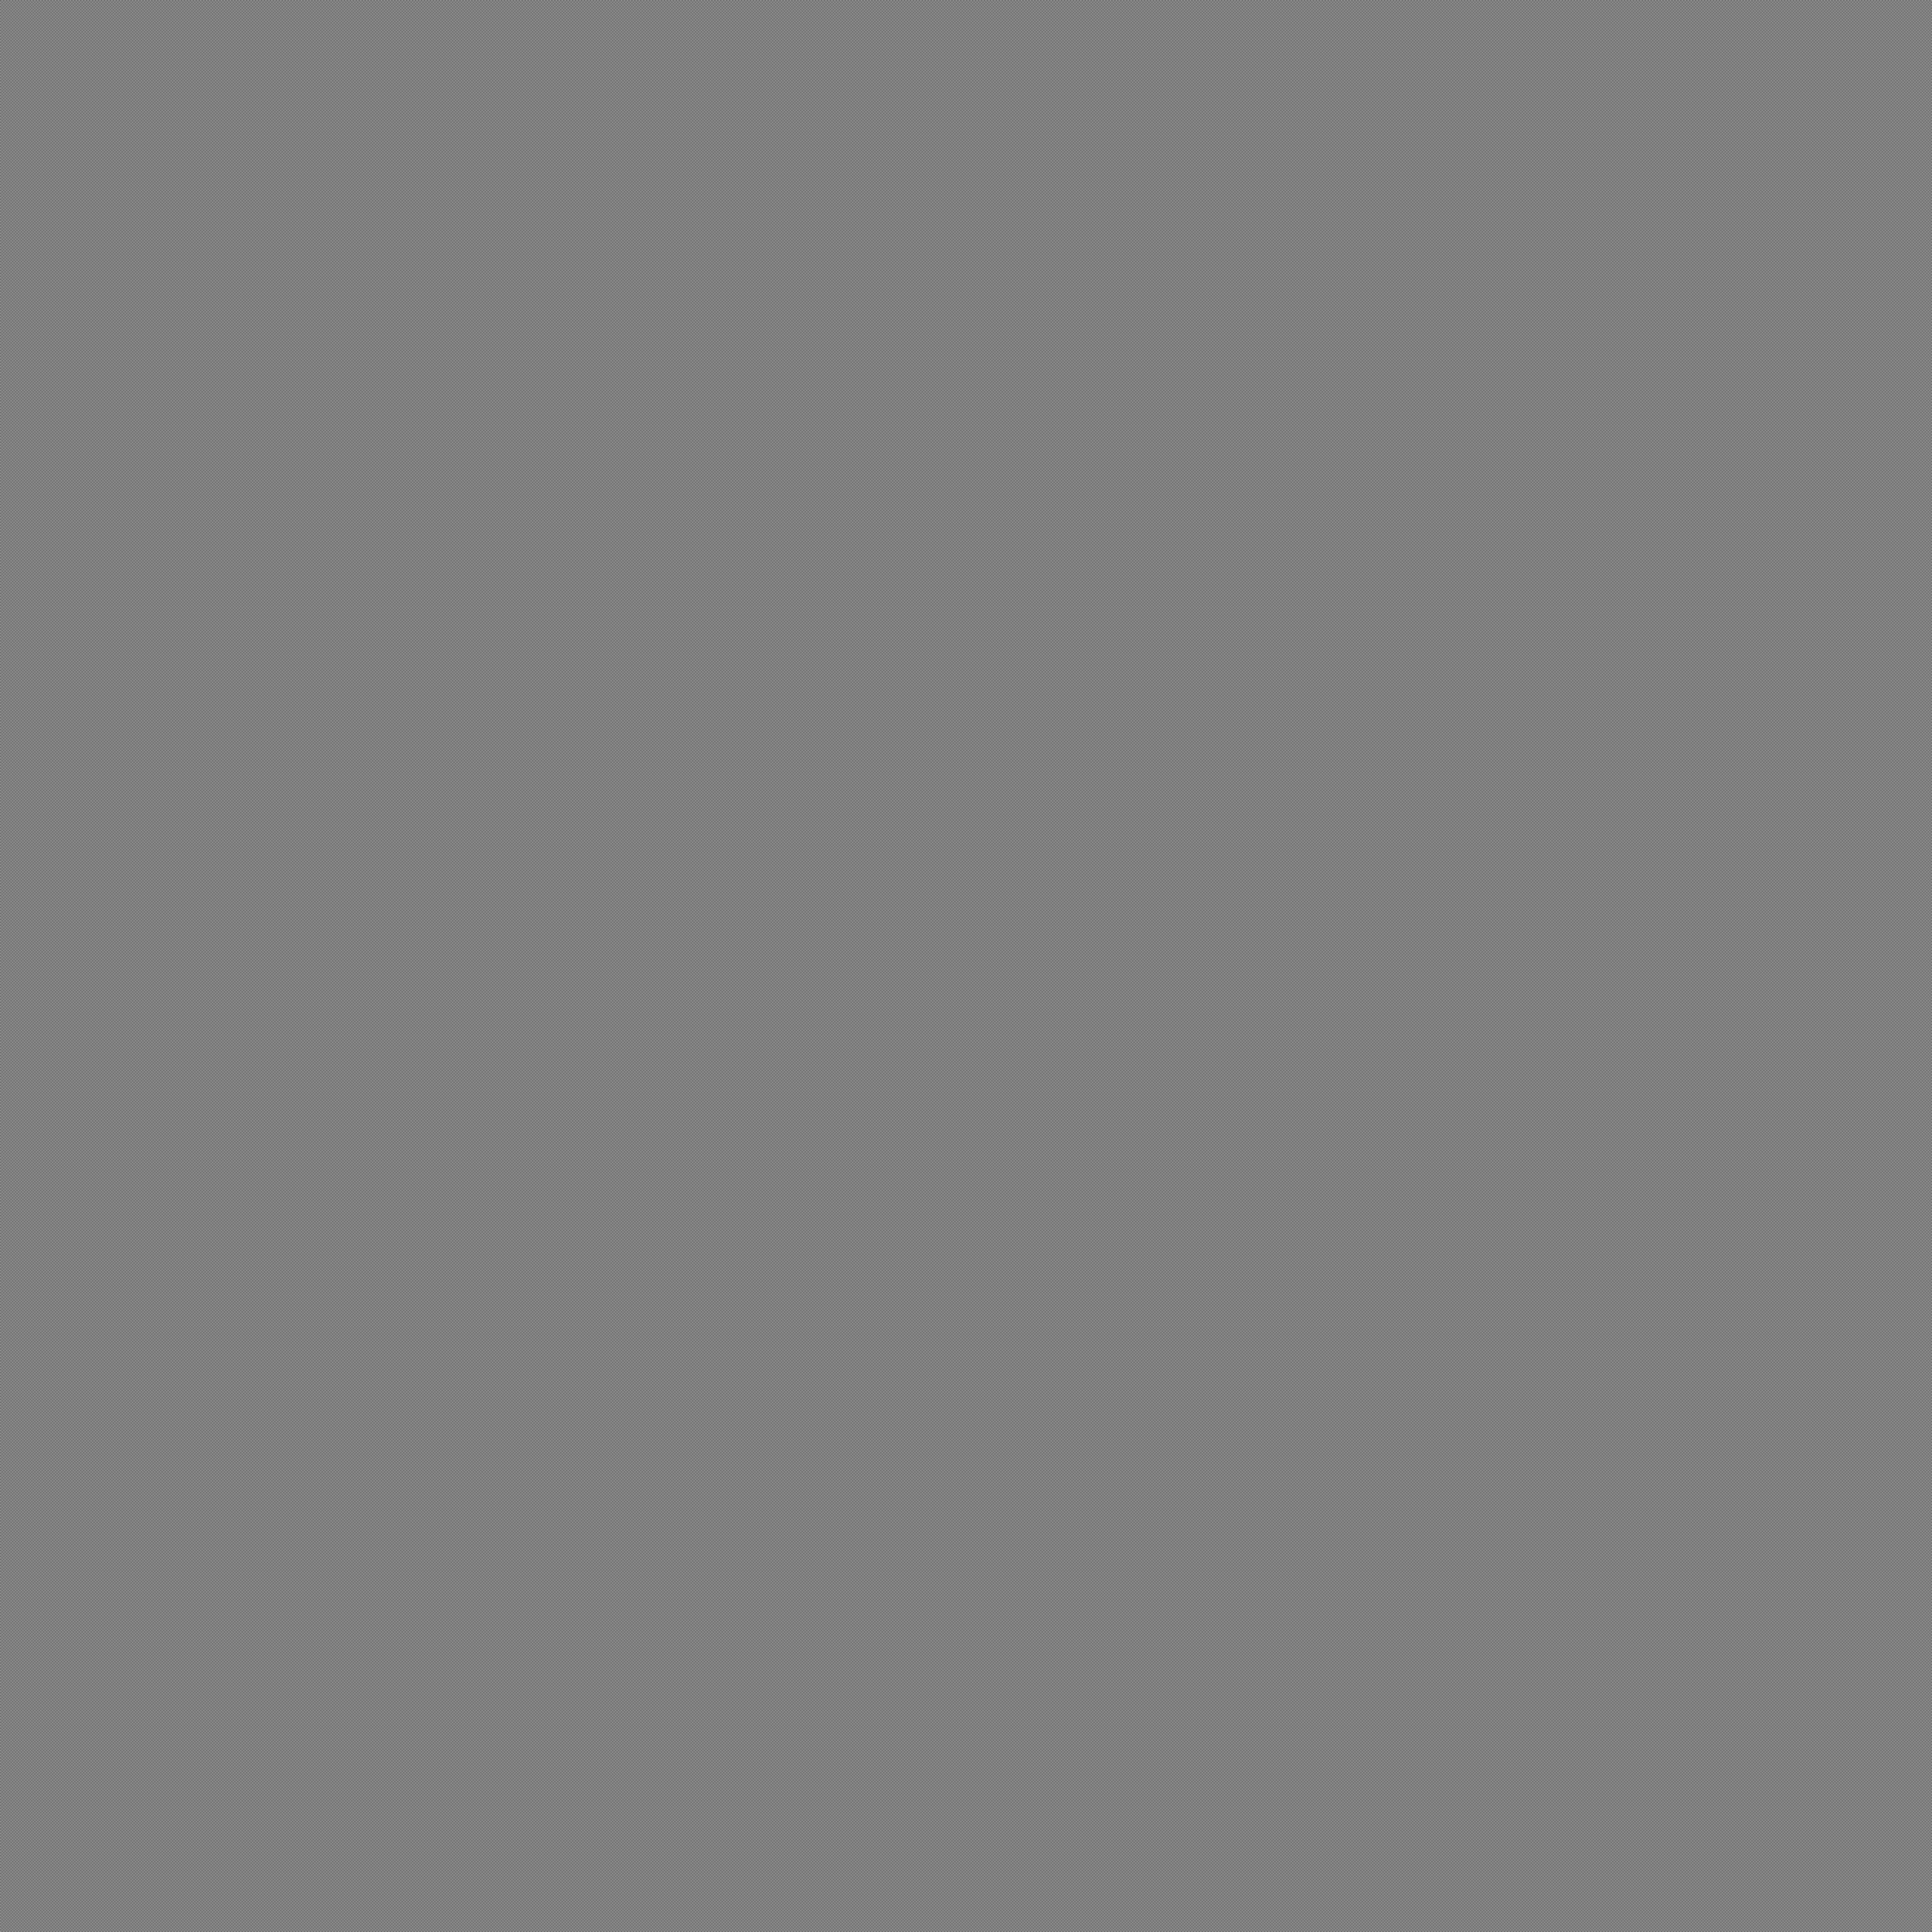 Check for broken pixels. Check monitor for broken pixels 6